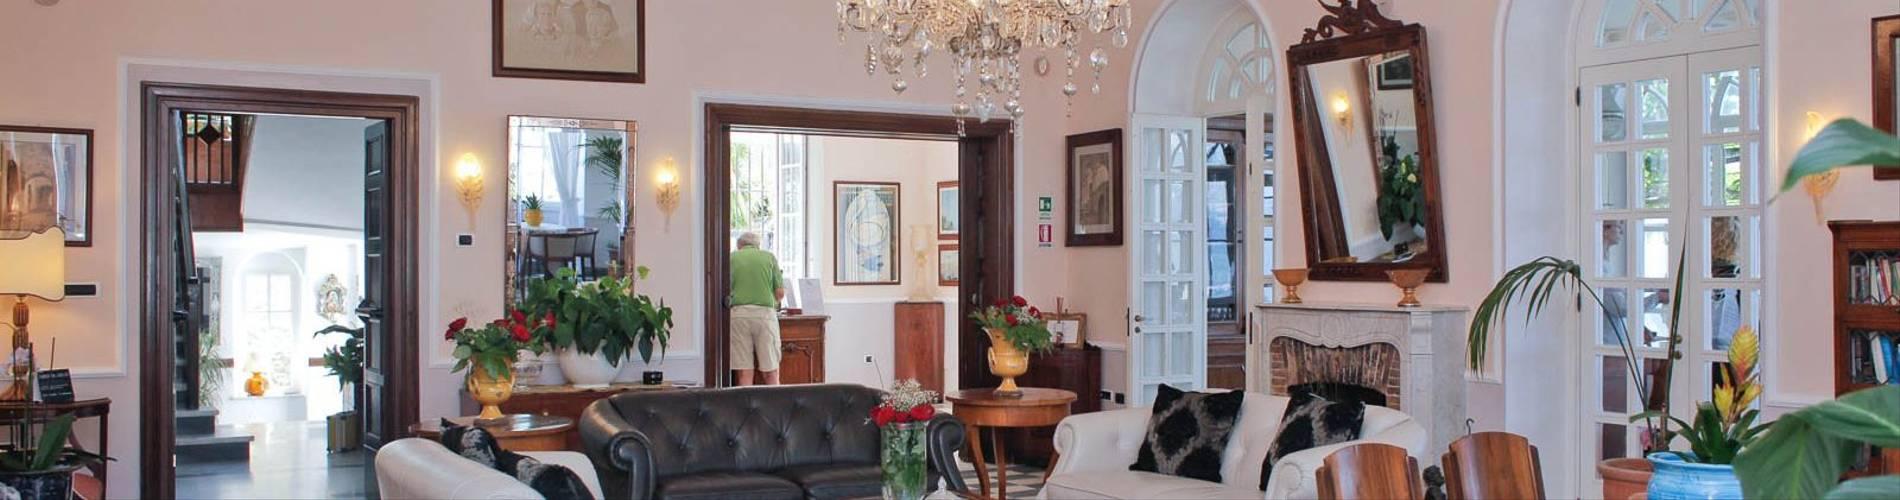 Villa Maria, Amalfi Coast, Italy (13).jpg